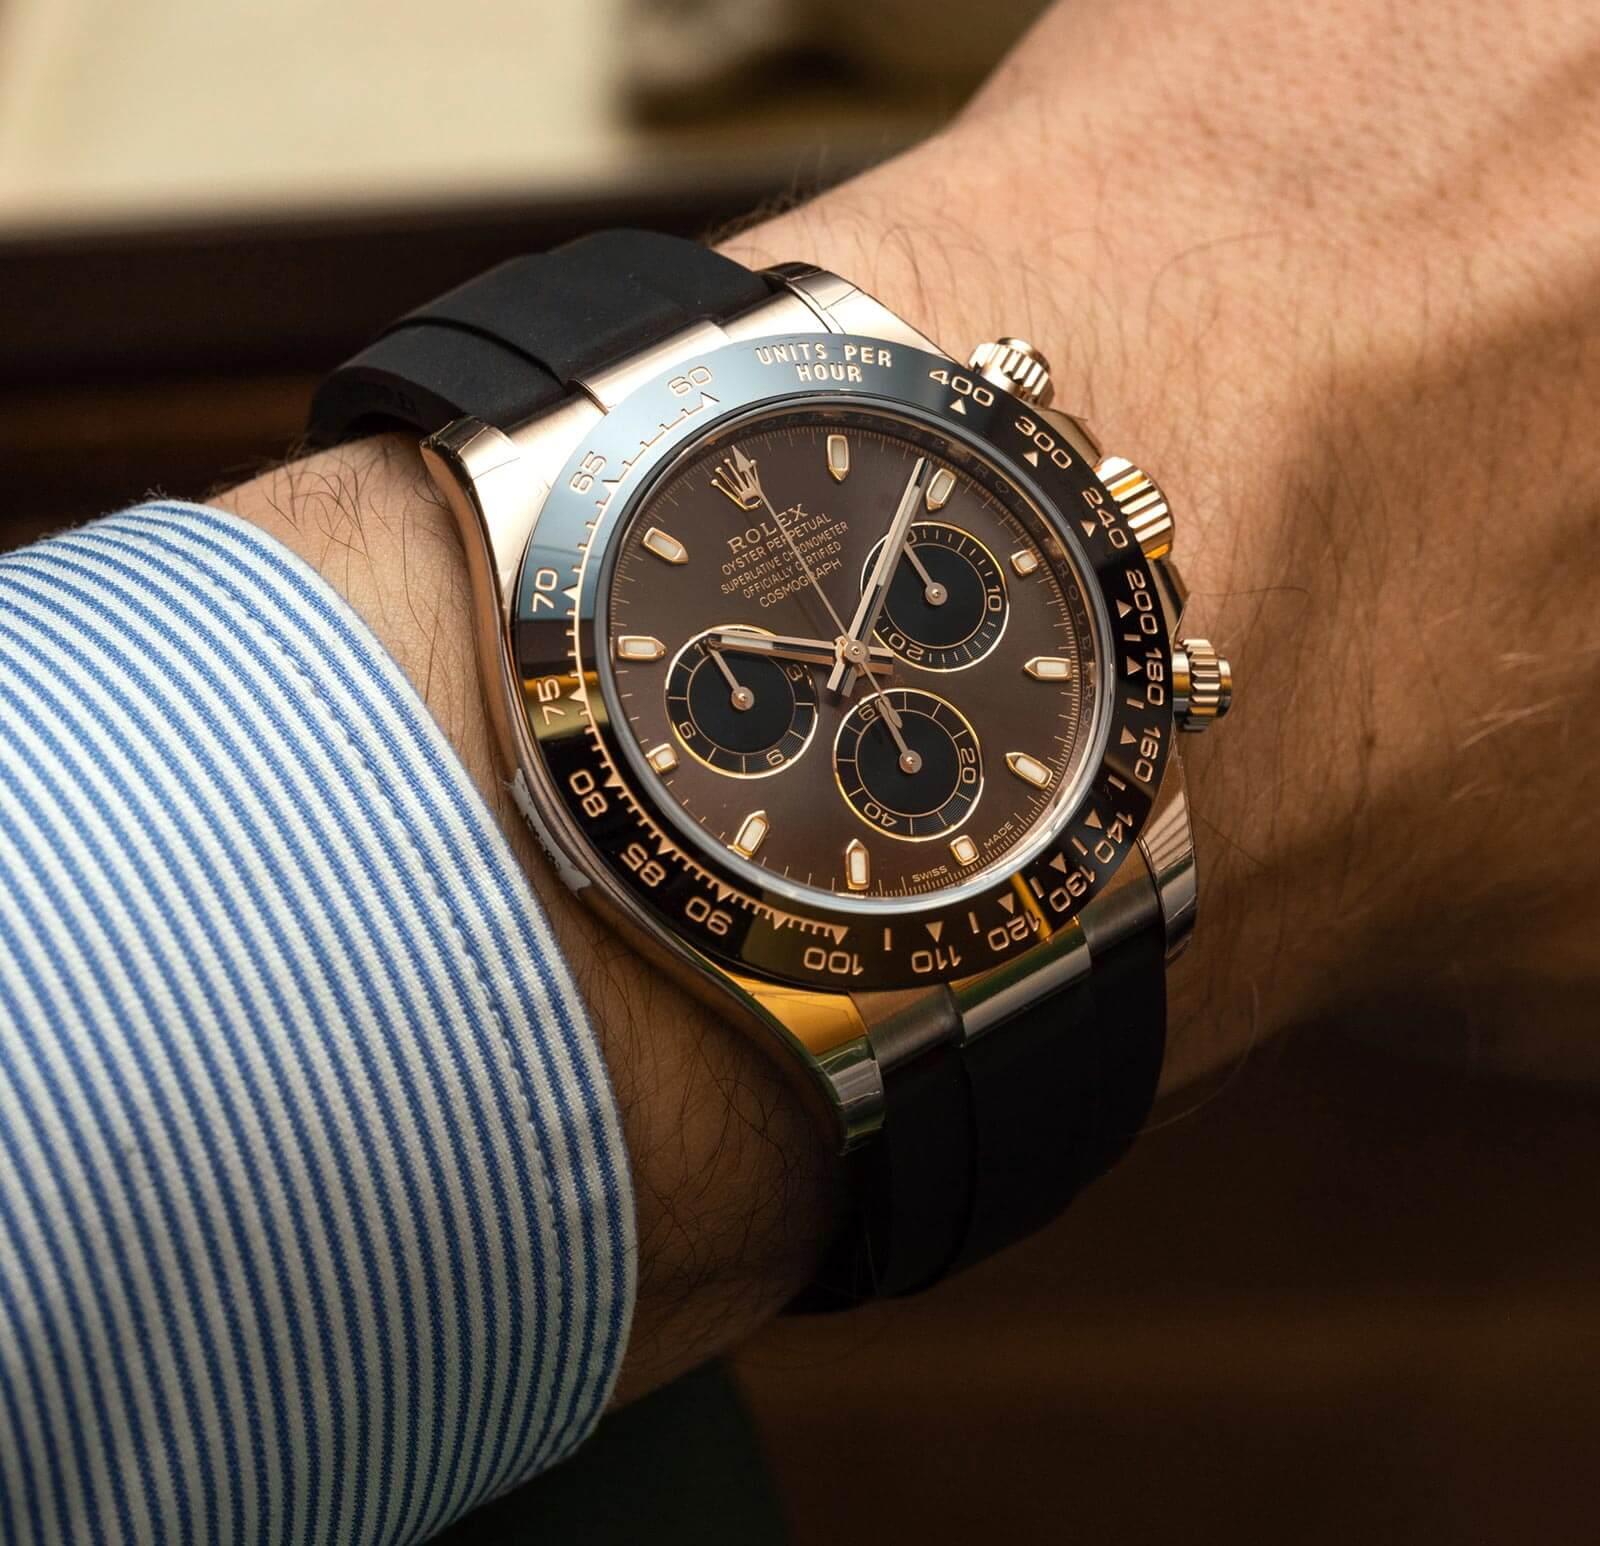 Rolex Cosmograph Daytona – Ref. 116515ln